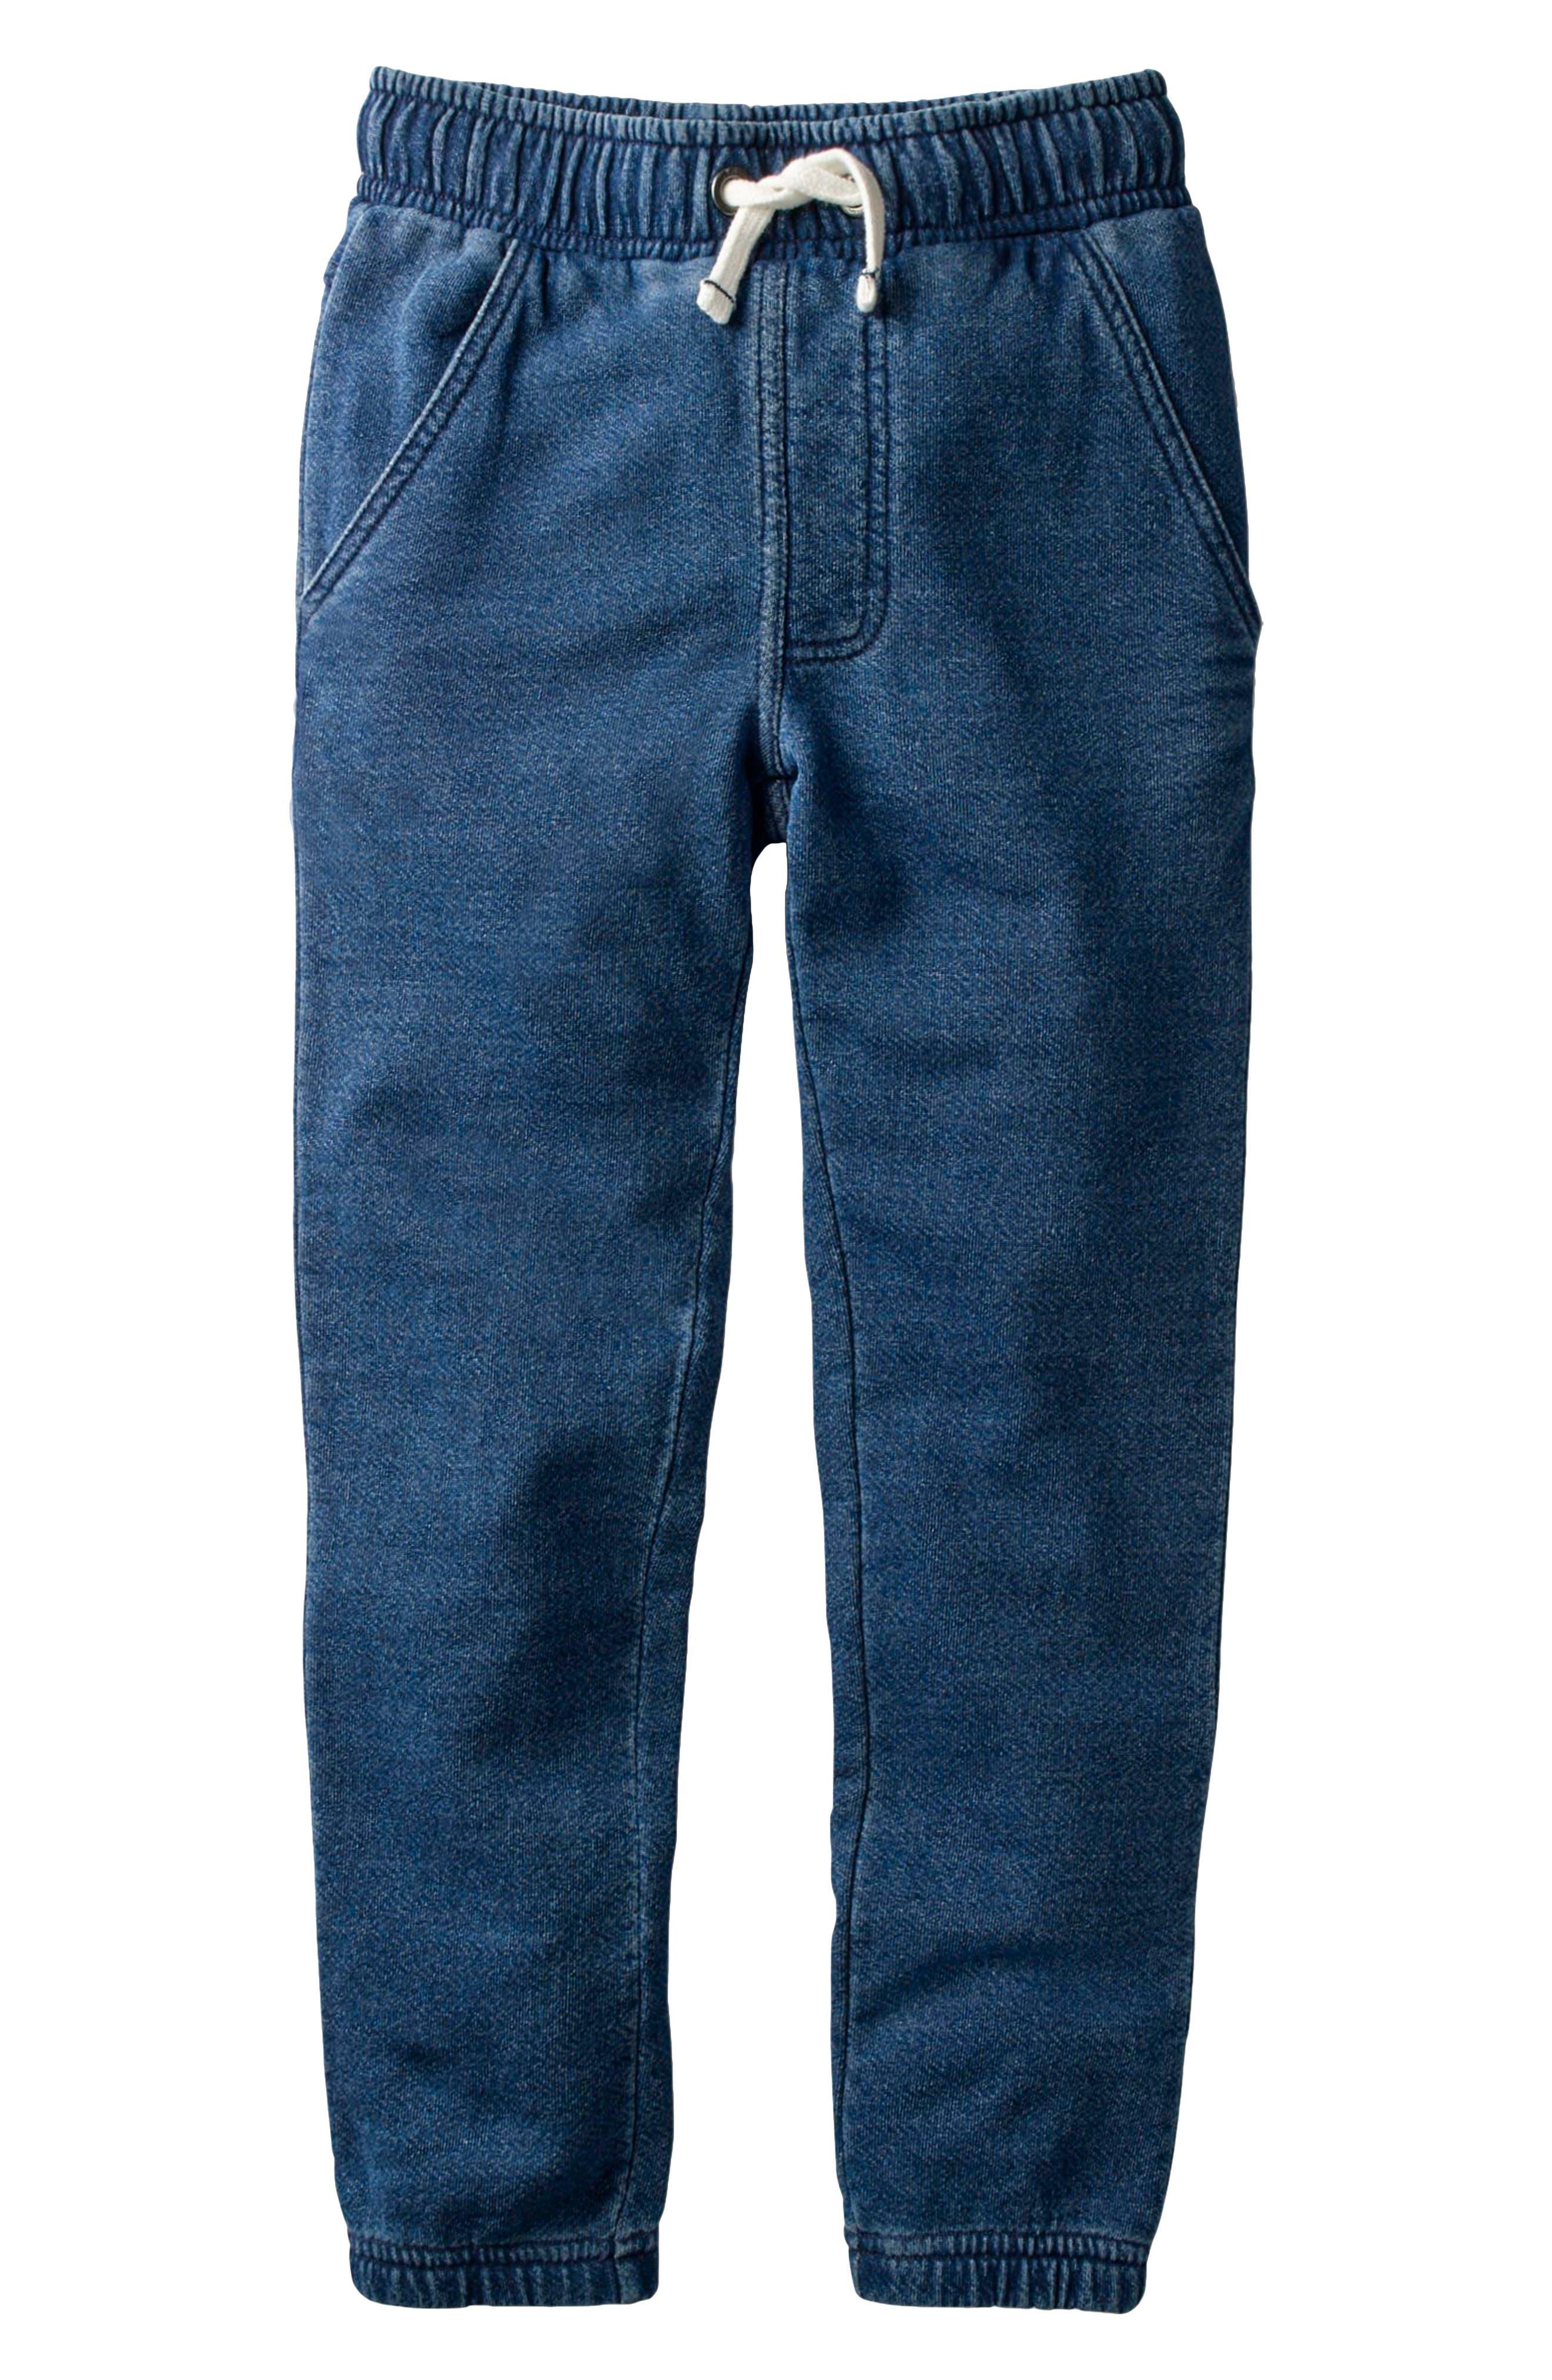 Jogger Pants,                         Main,                         color, Indigo Blue